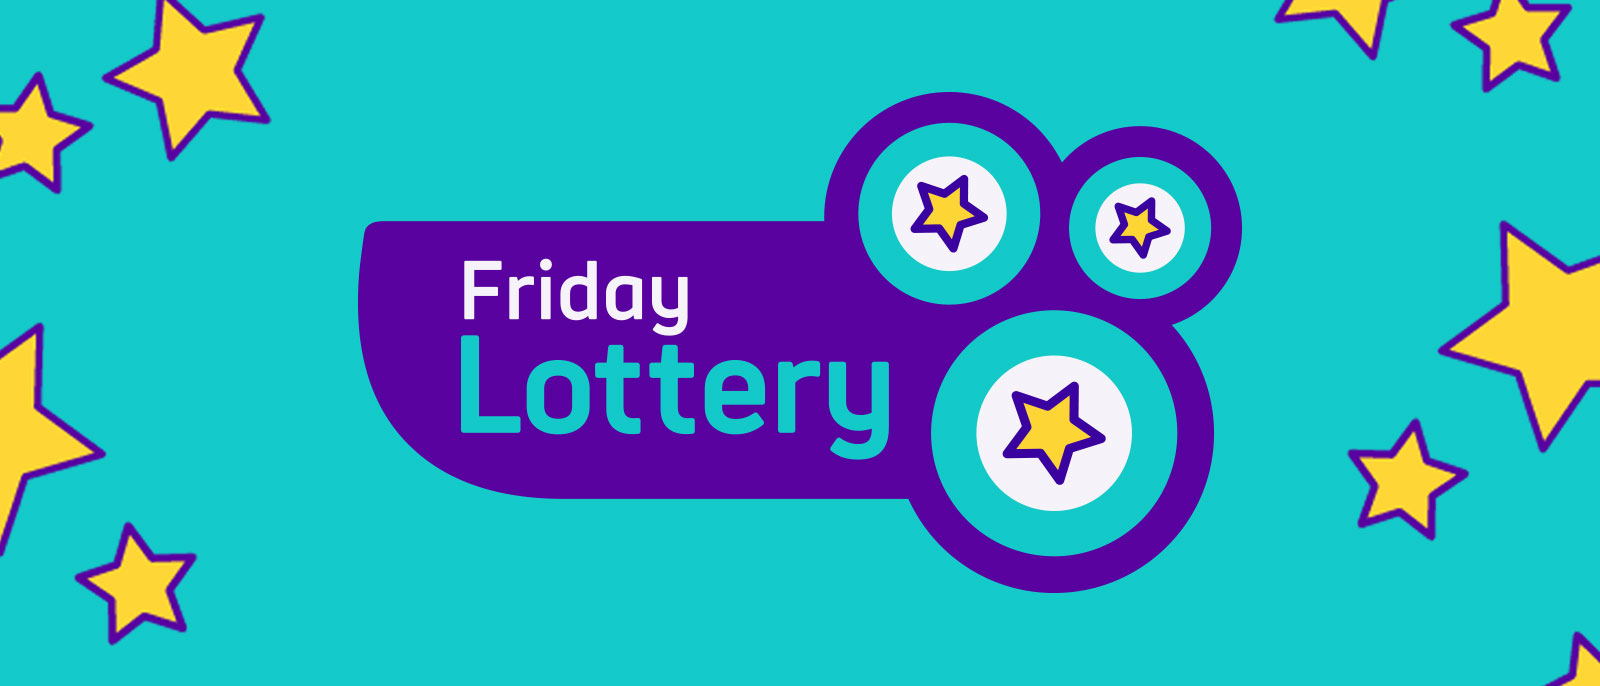 Scope Friday lottery   Disability charity Scope UK